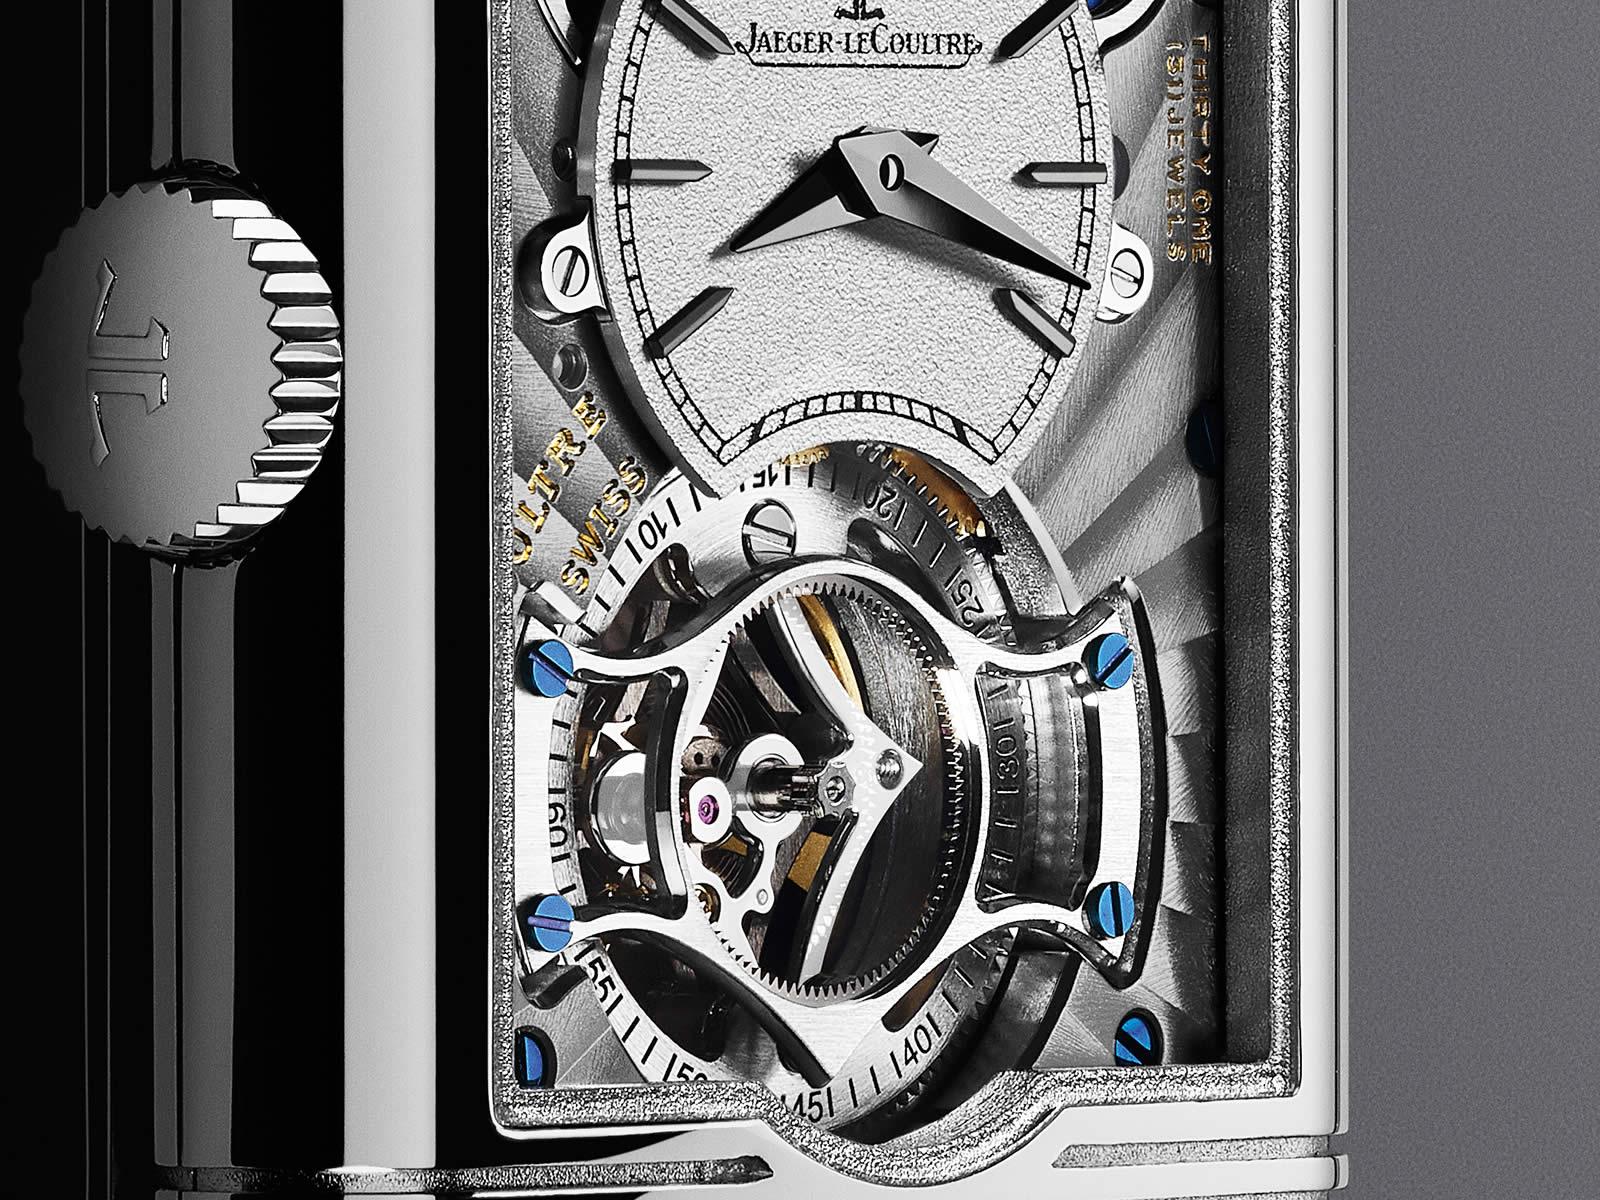 q3926480-jaeger-lecoultre-reverso-tribute-tourbillon-duoface-platinum-7-.jpg